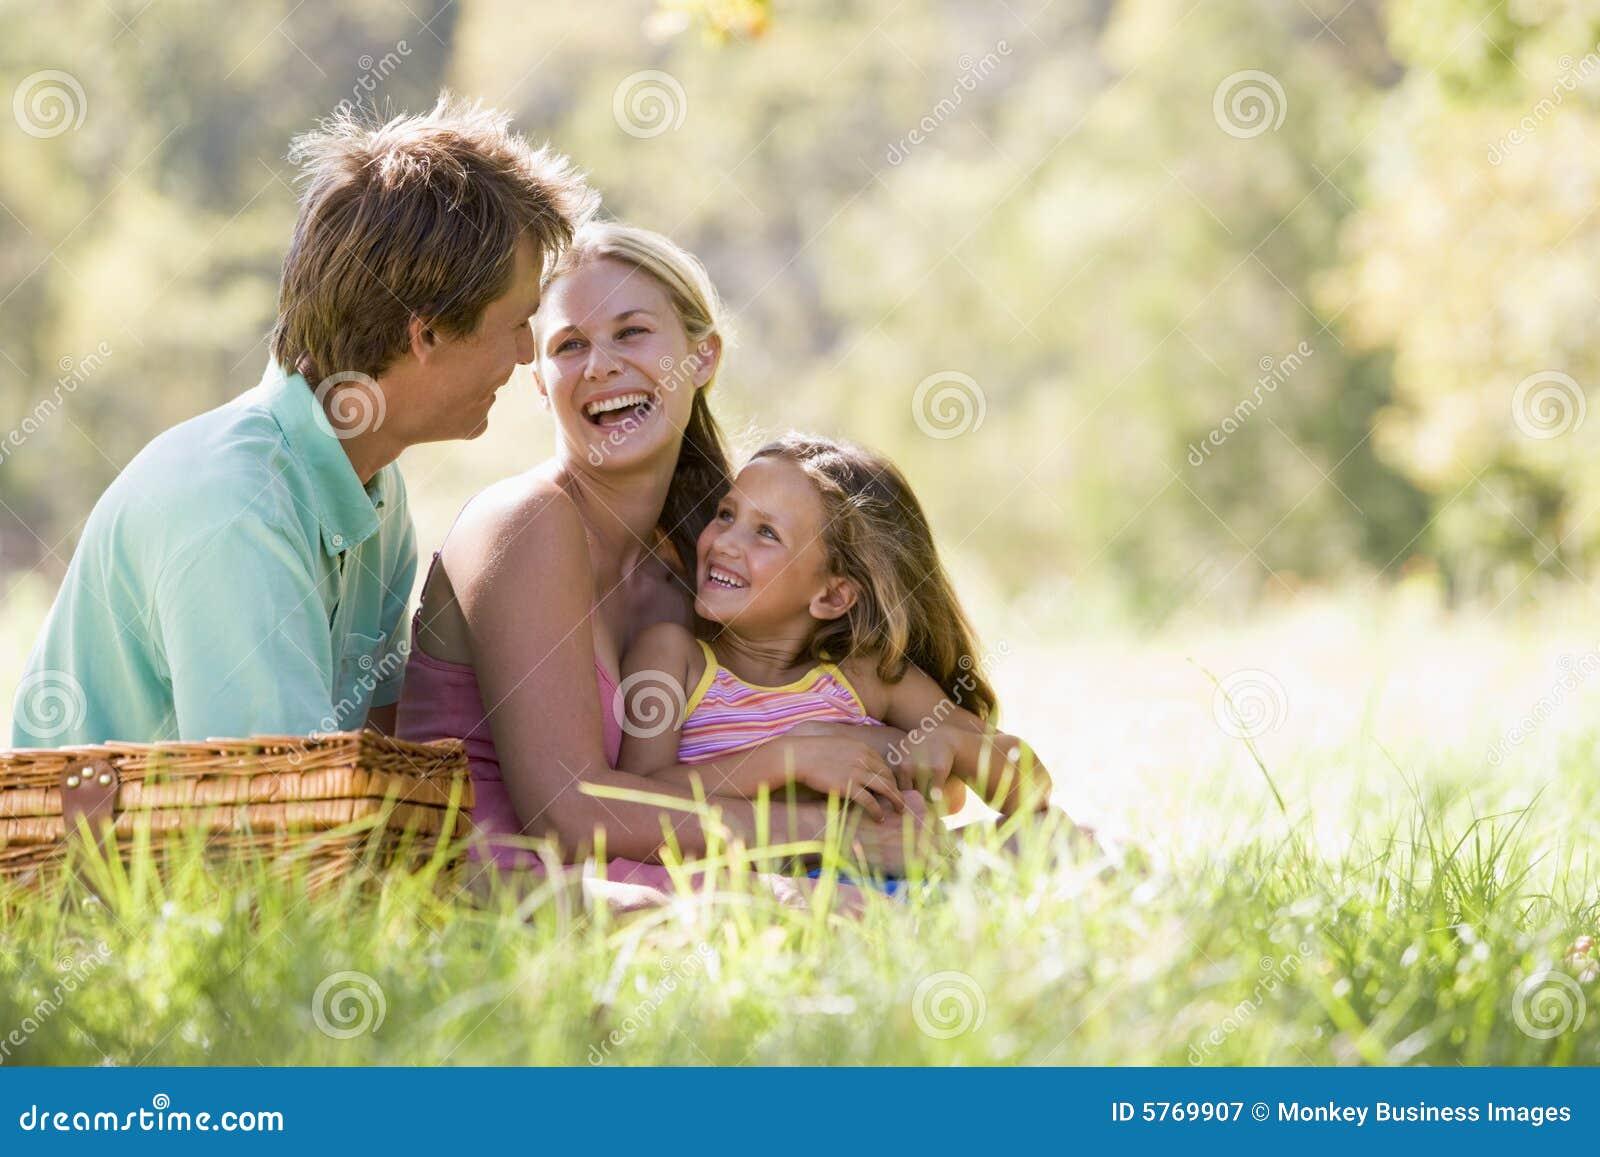 Family having laughing park picnic